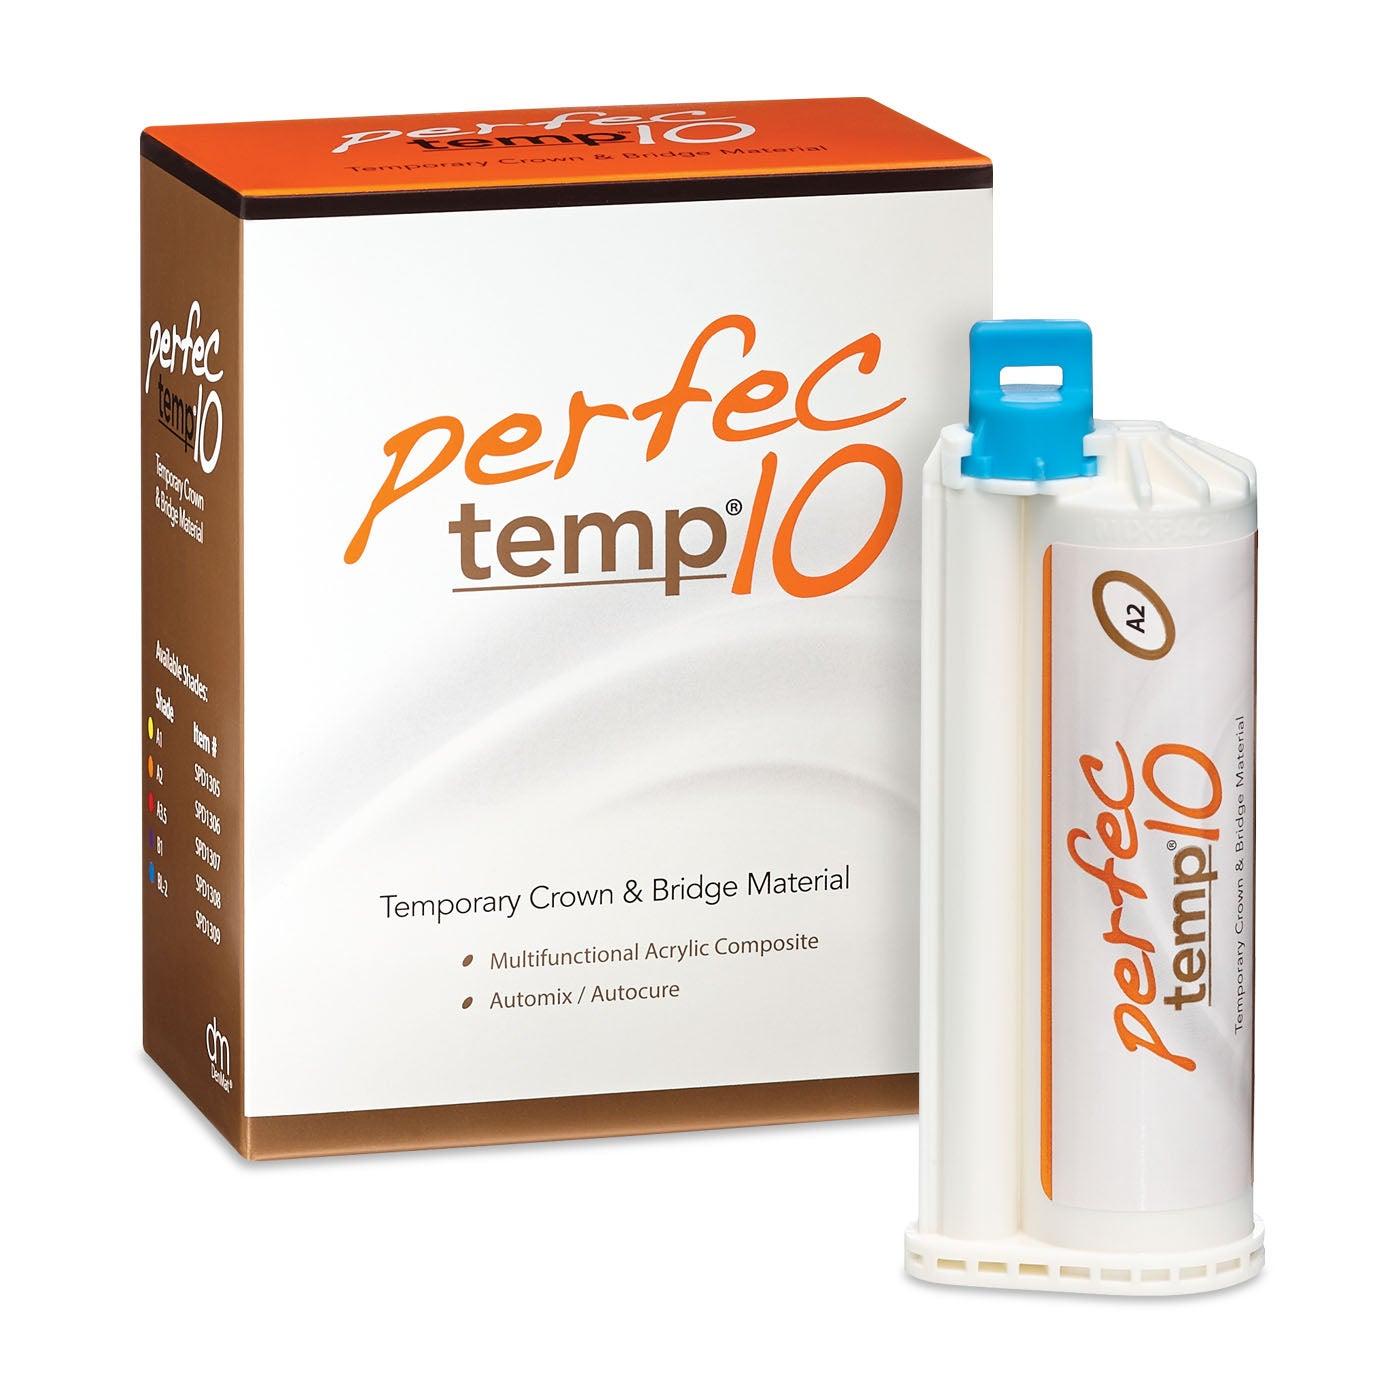 Dental Temporary Material - Perfectemp10 A2